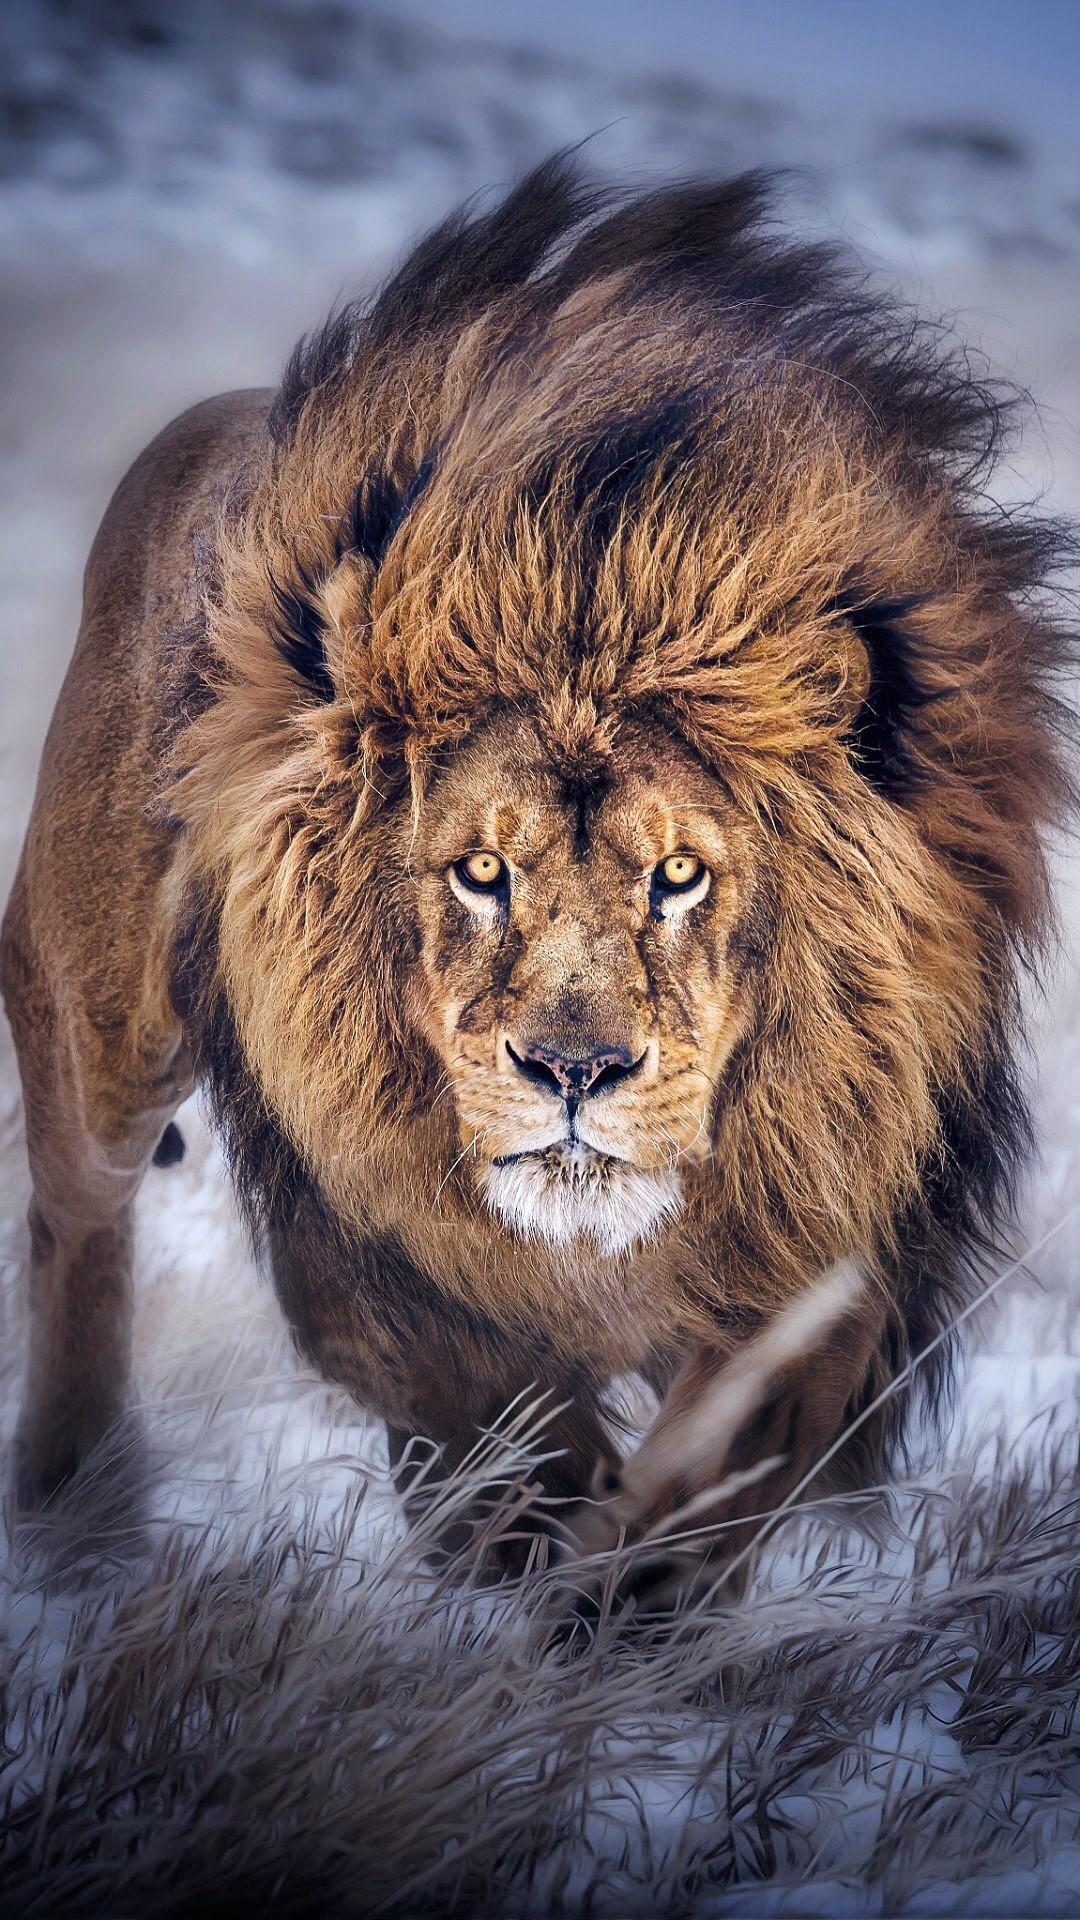 8k Animal Wallpaper Download: Lion Wallpaper (73+ Images